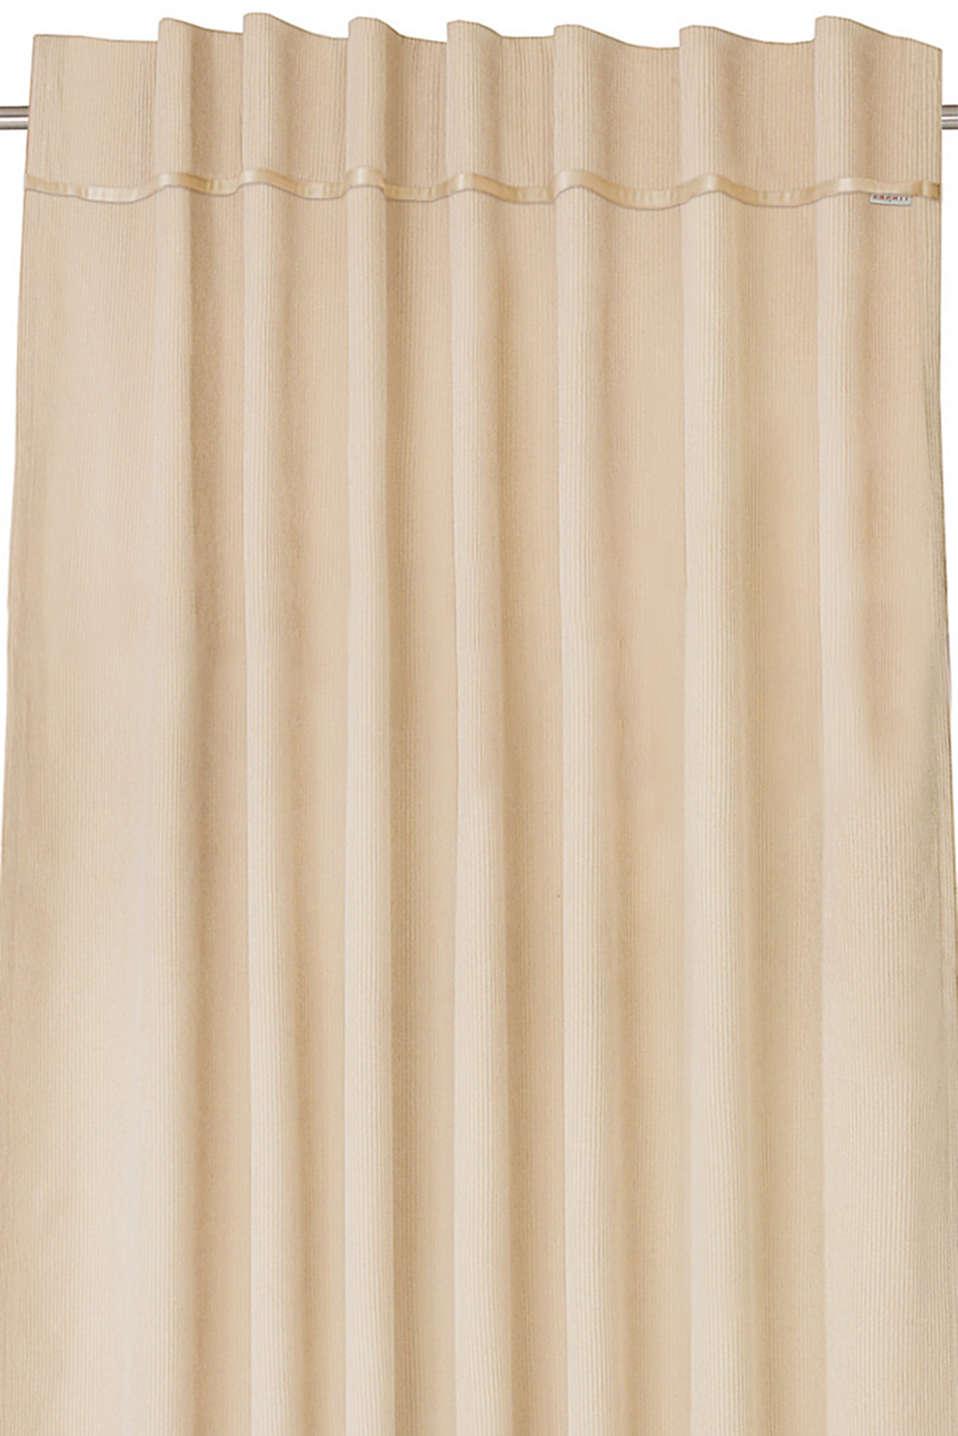 Corduroy curtains with concealed loops, BEIGE, detail image number 2